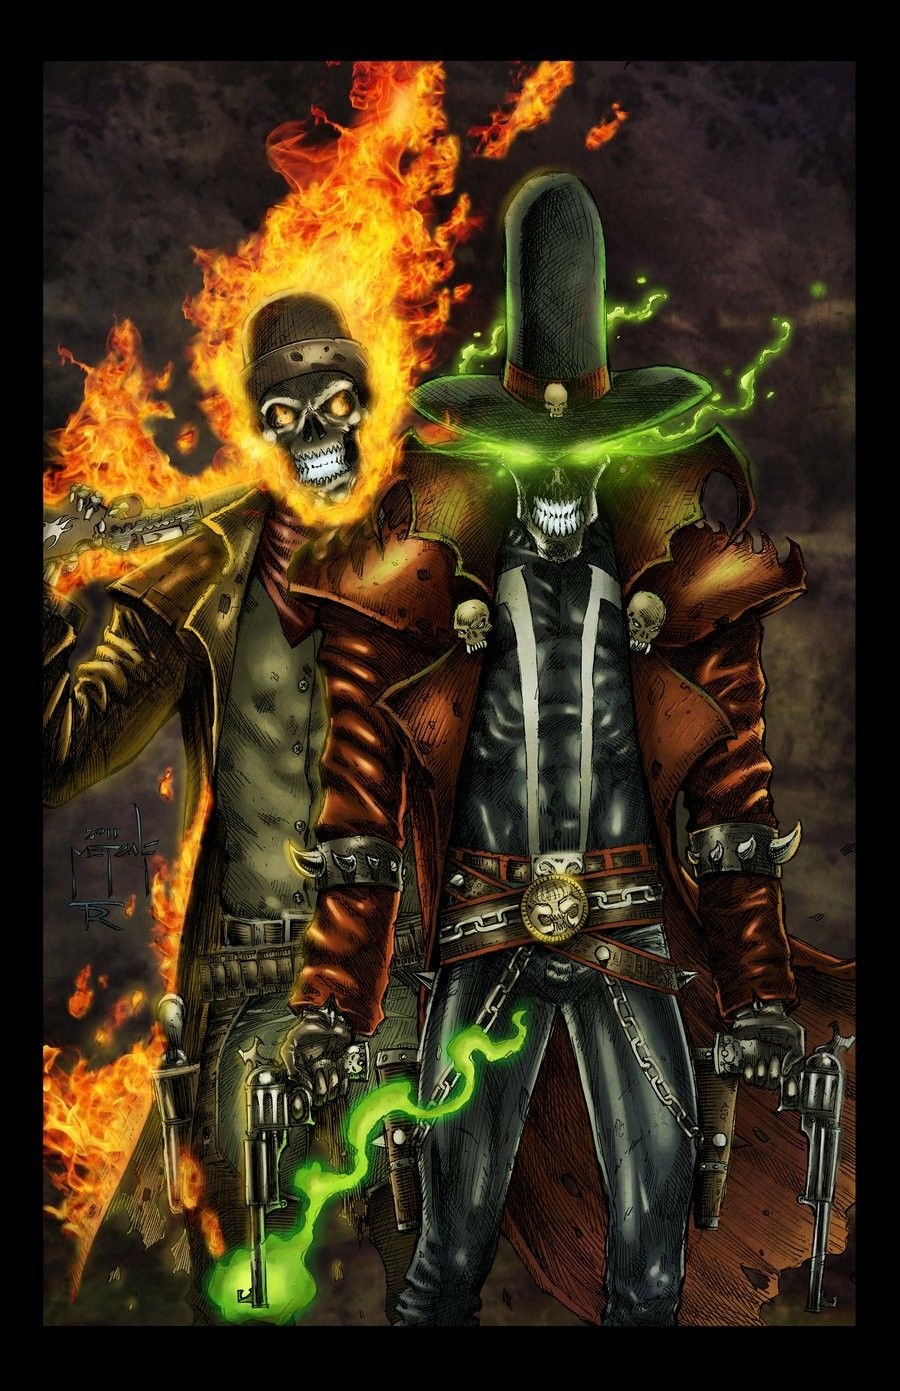 Ghost Rider & Spawn | Comic books | Pinterest | Imagenes chidas y Cosas